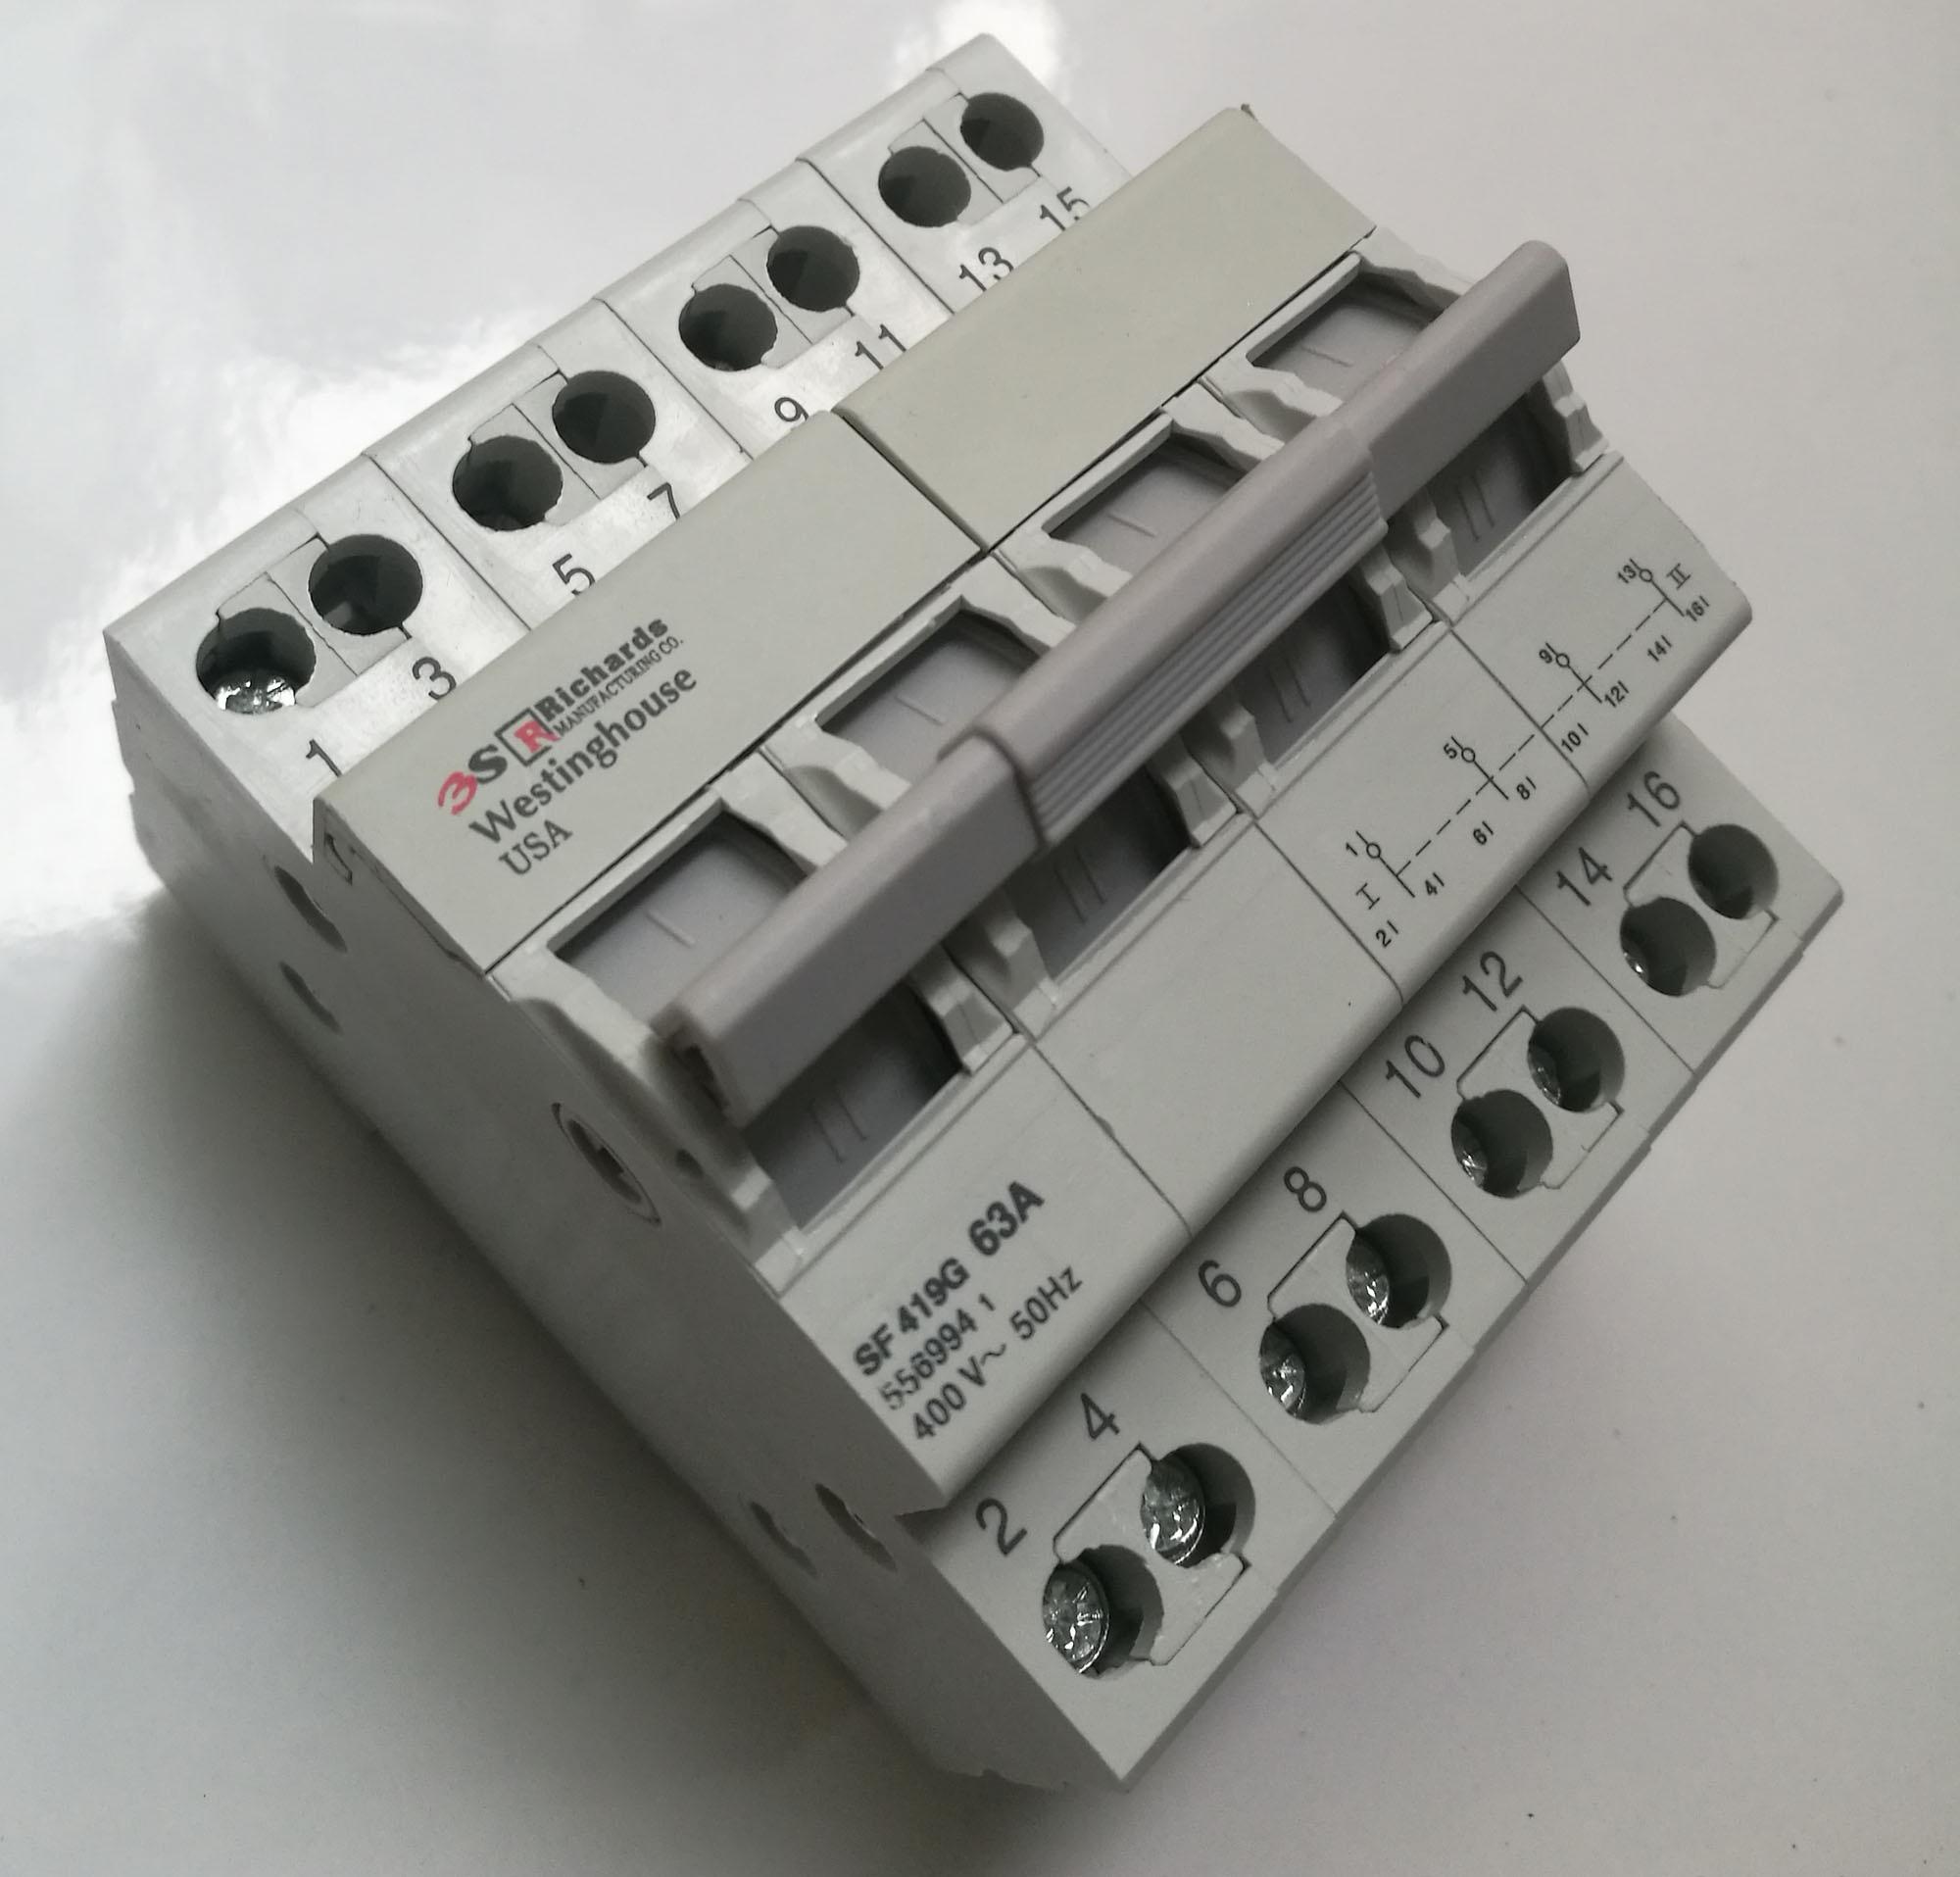 CẦU DAO ĐẢO CHIỀU MINI-4P-40A- RICHARDS